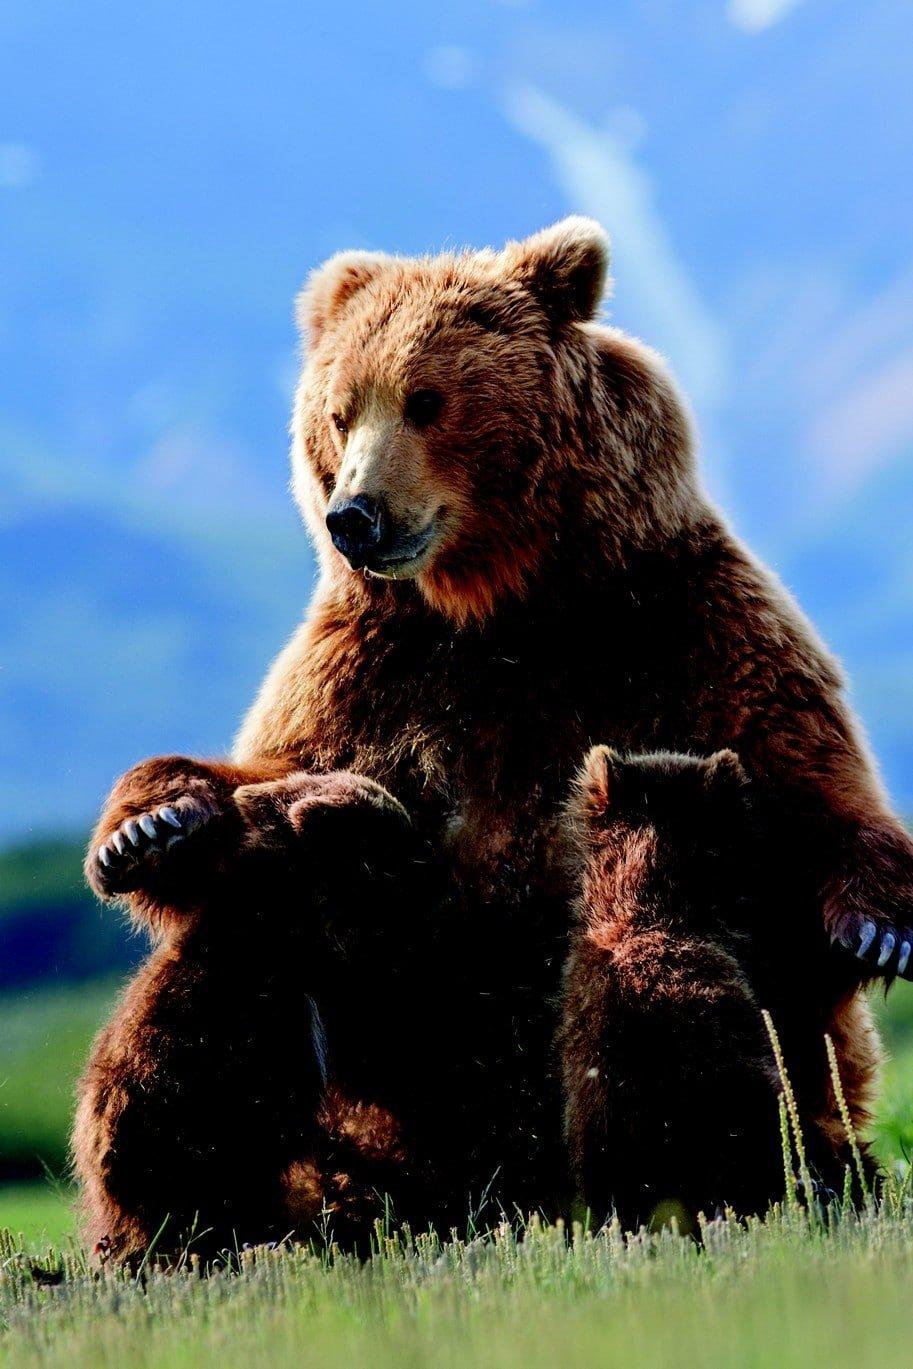 Grizzly 8vdhgh49ej1fhp6i